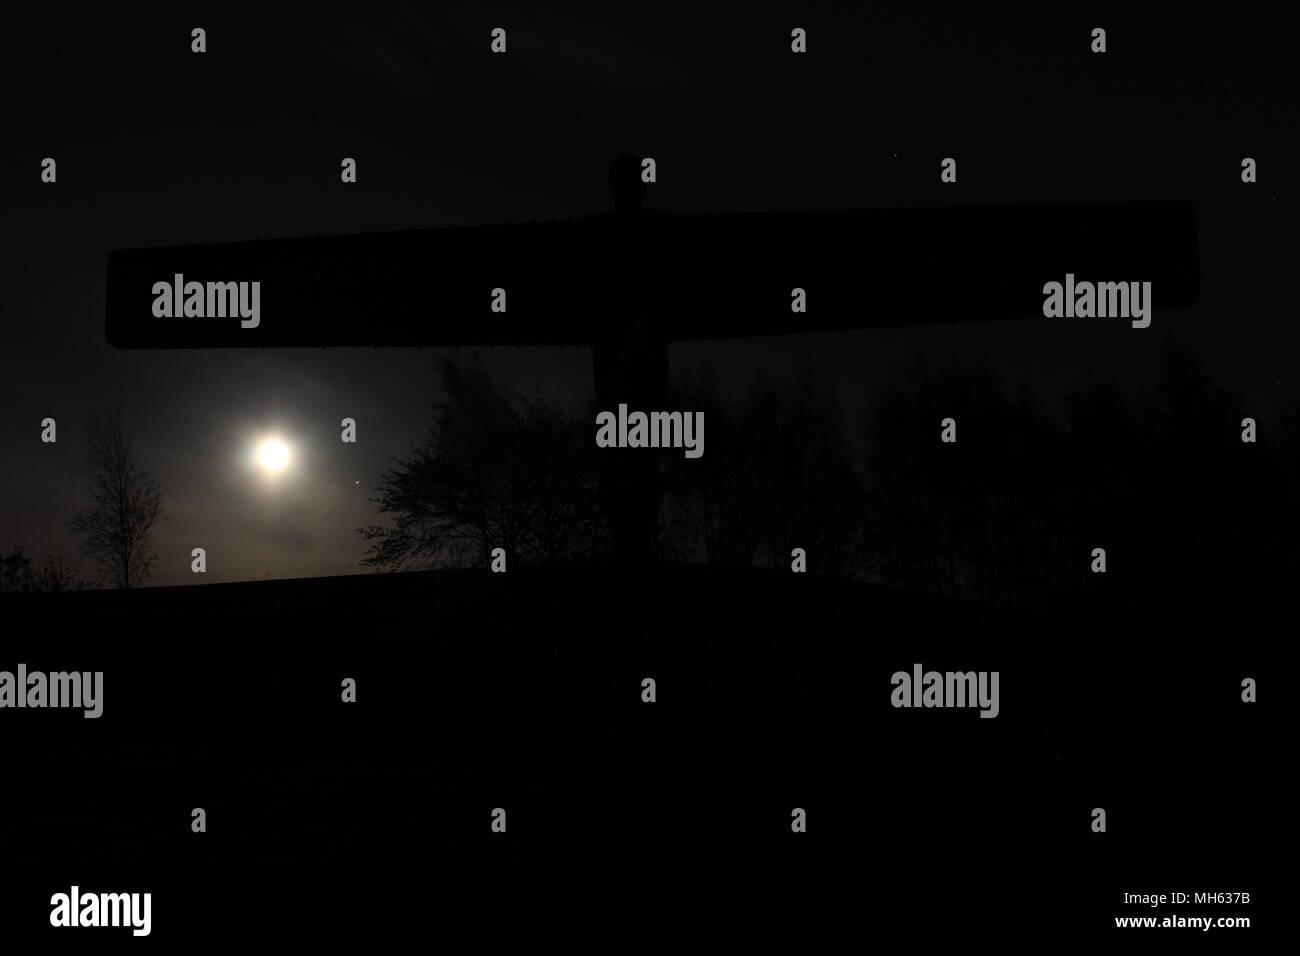 Galileo Galilei And TelescopeStock Photos and Images